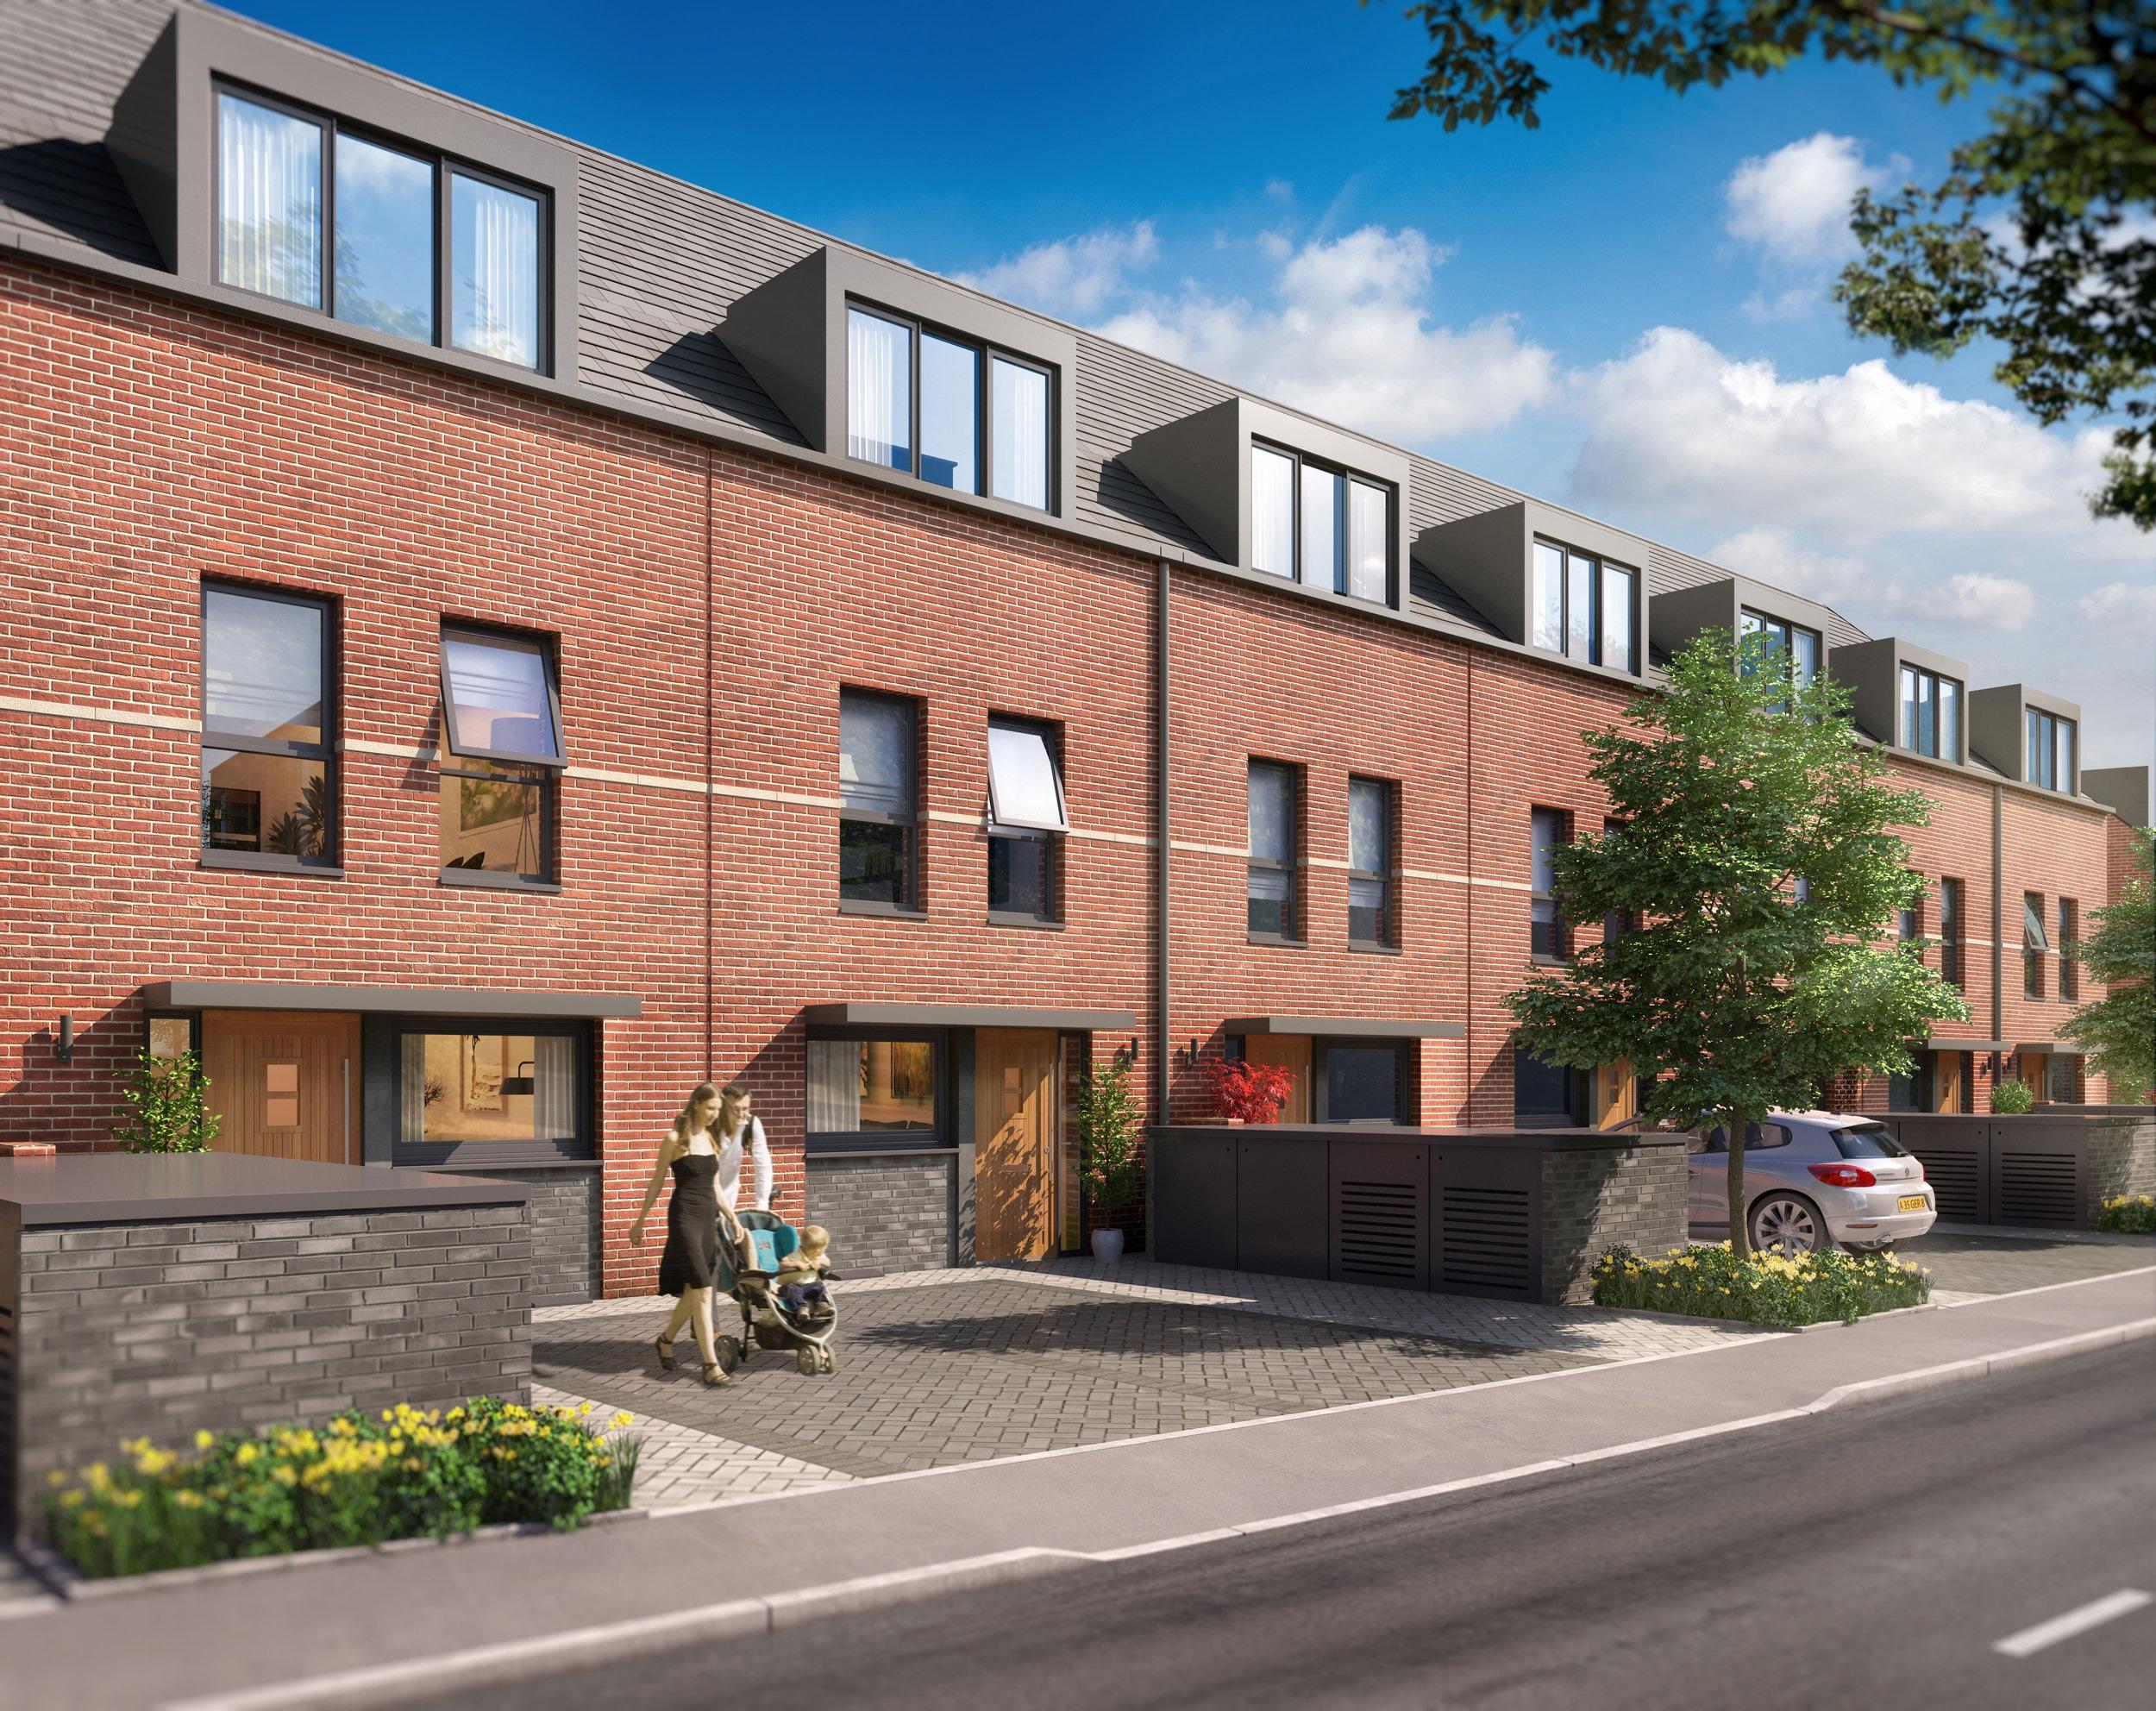 4 bedroom terraced house for sale in bolingbroke park for 67 park terrace east